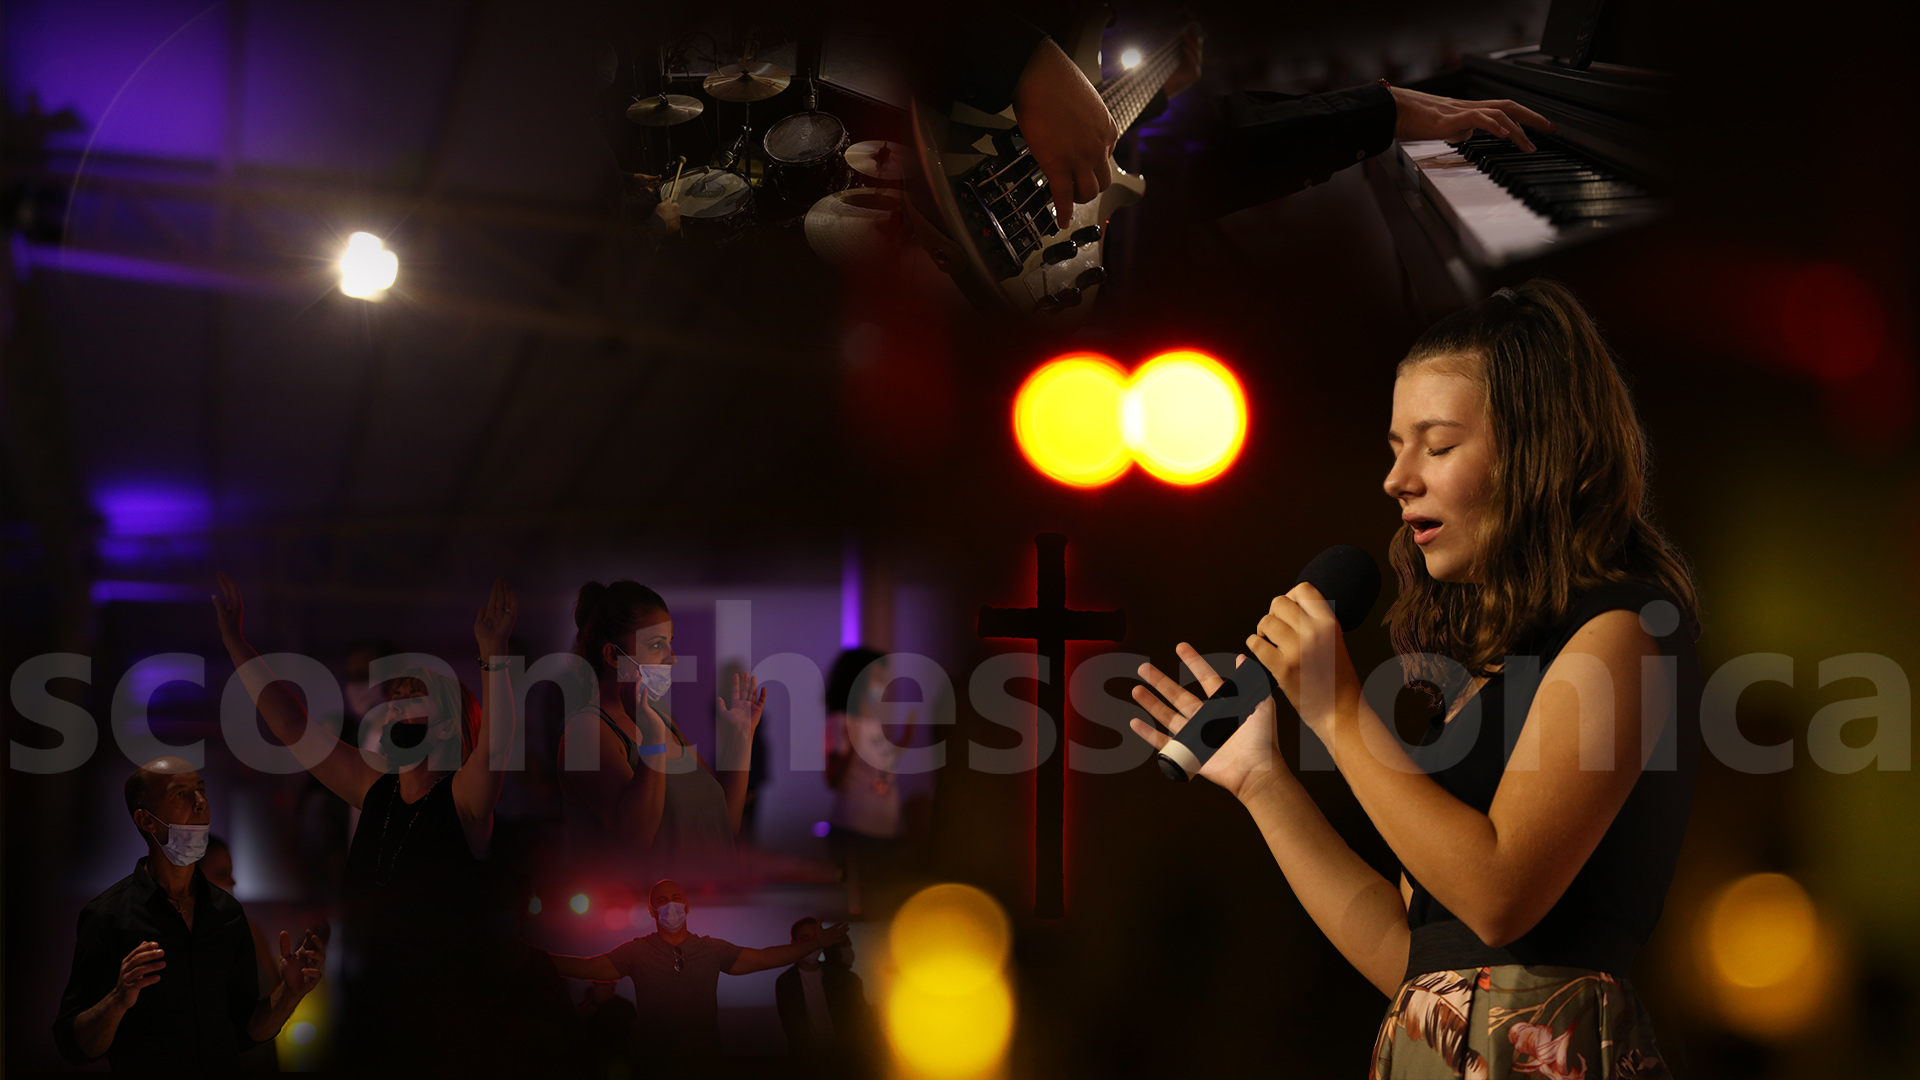 SCOAN_THESSALONICA_WORSHIP_2020_09_06